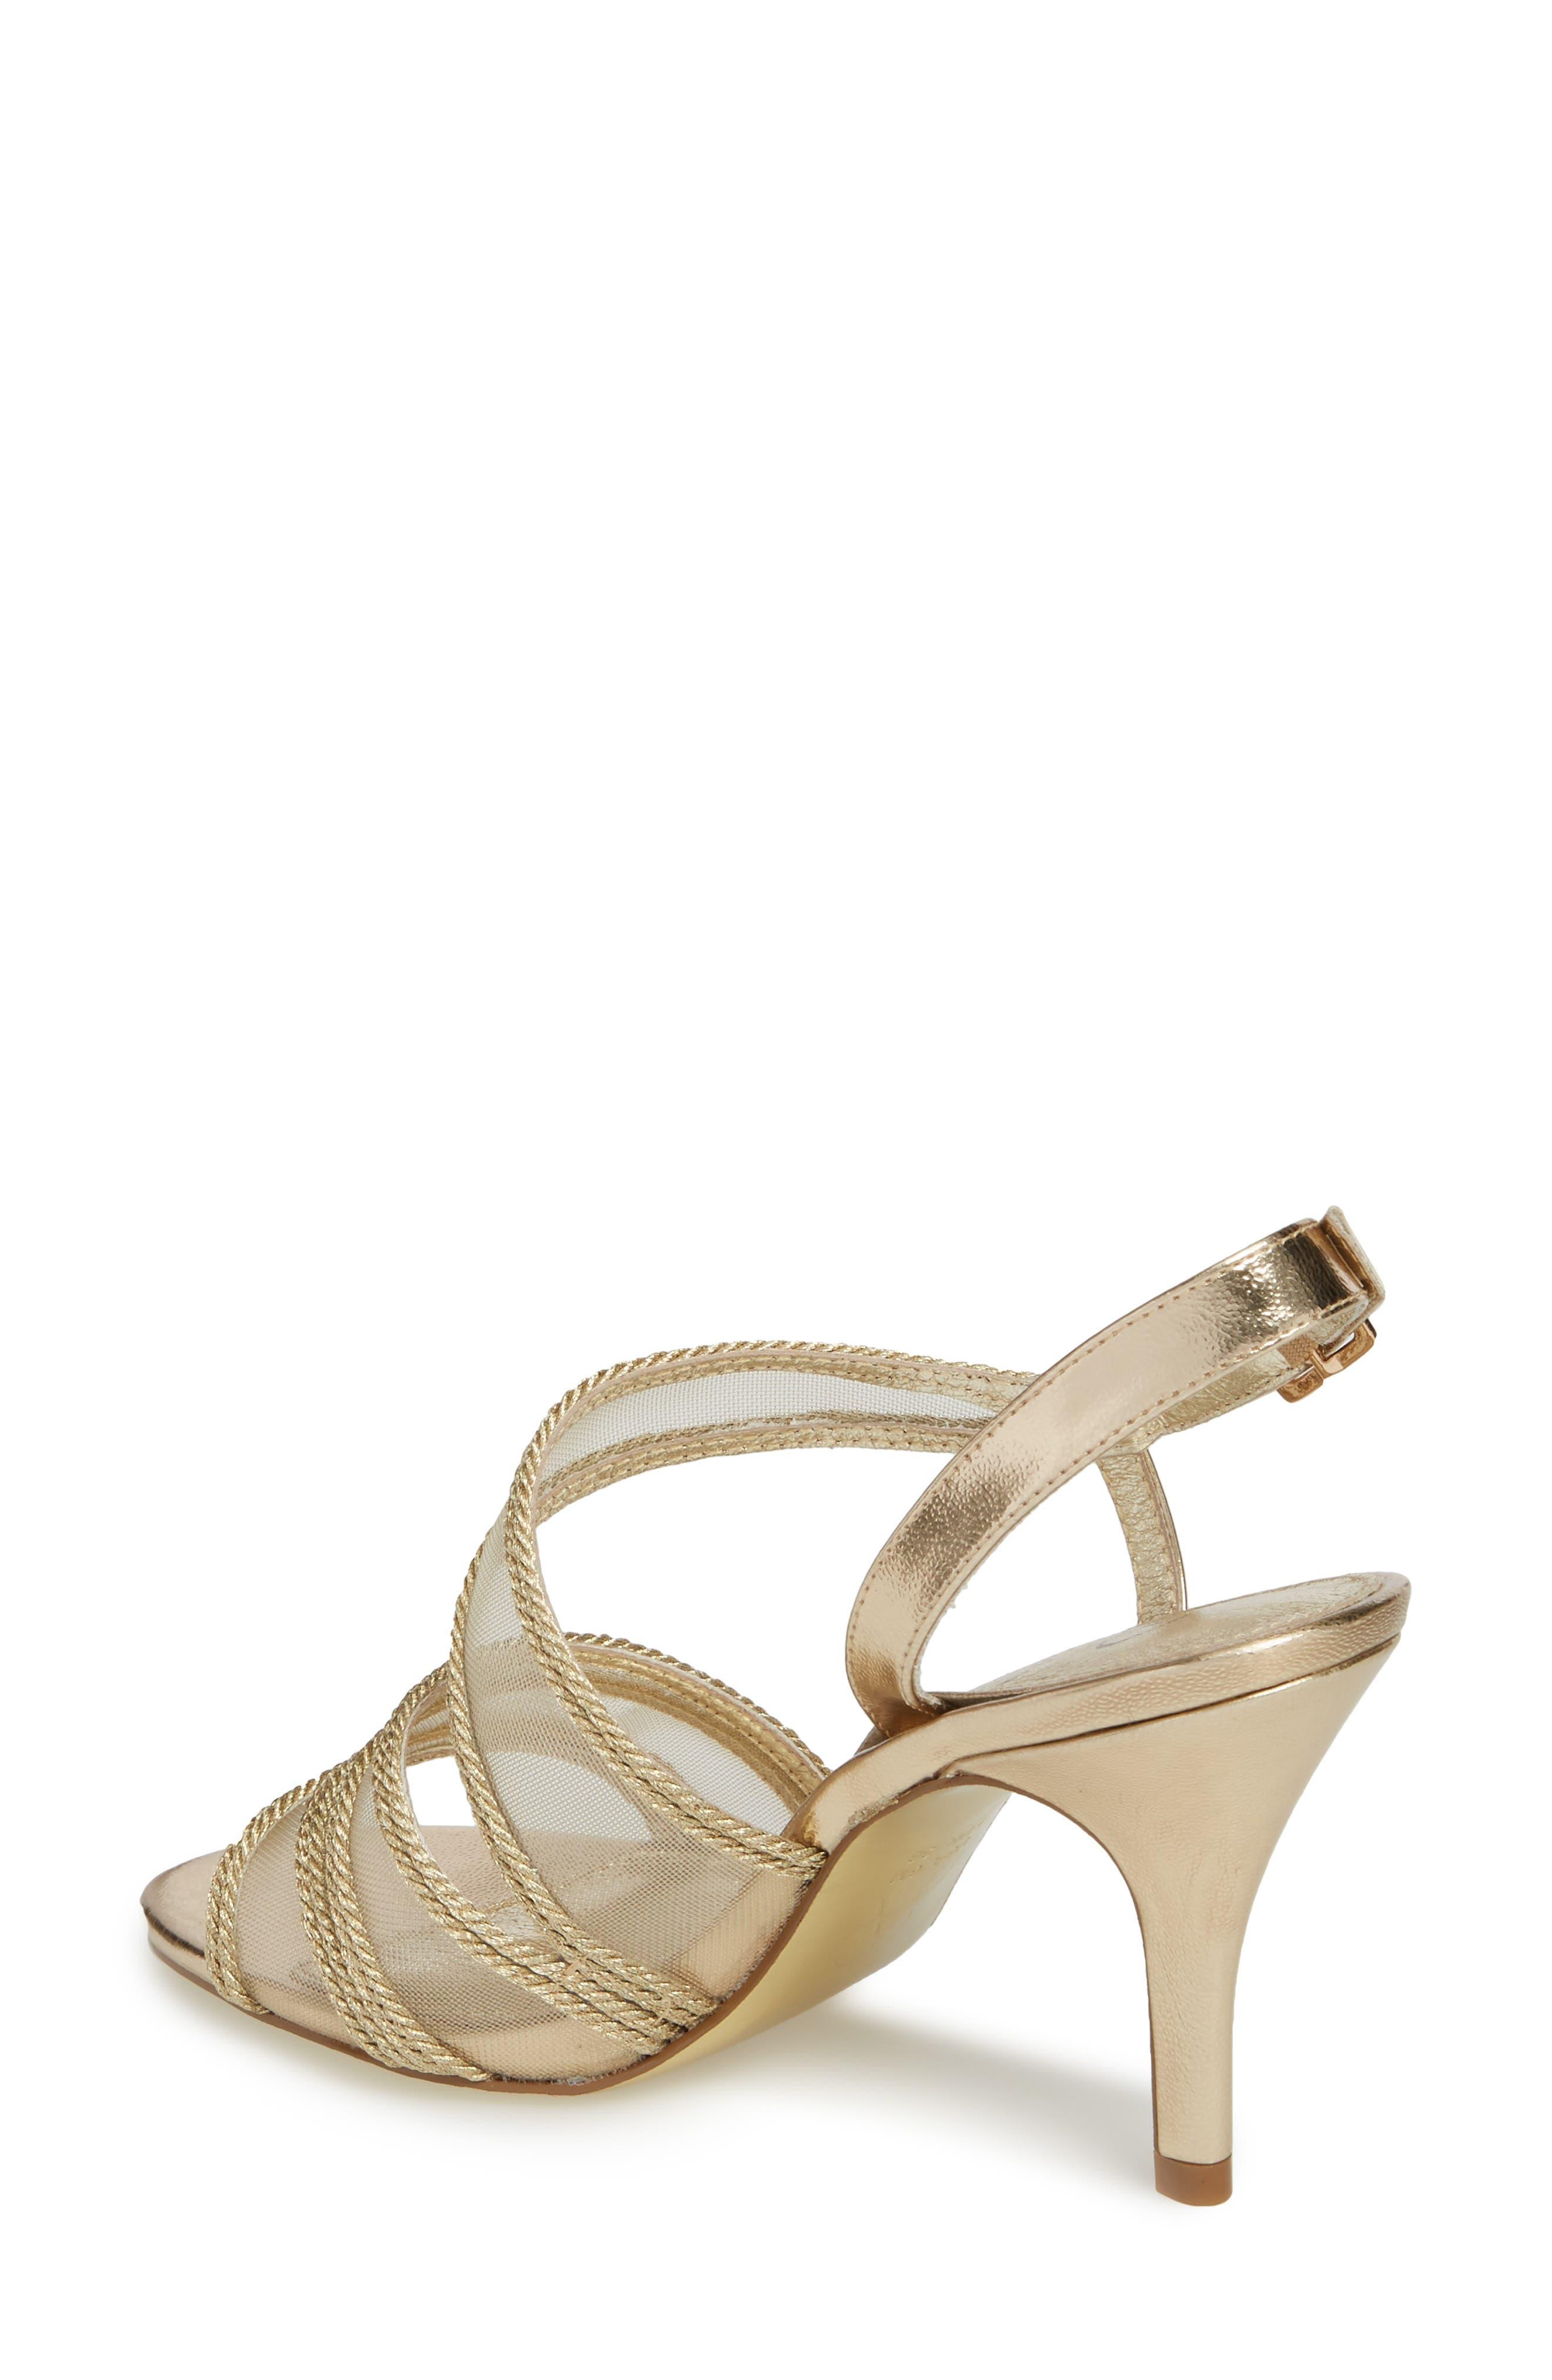 Adelphi Asymmetrical Mesh Sandal,                             Alternate thumbnail 2, color,                             Platinum Fabric